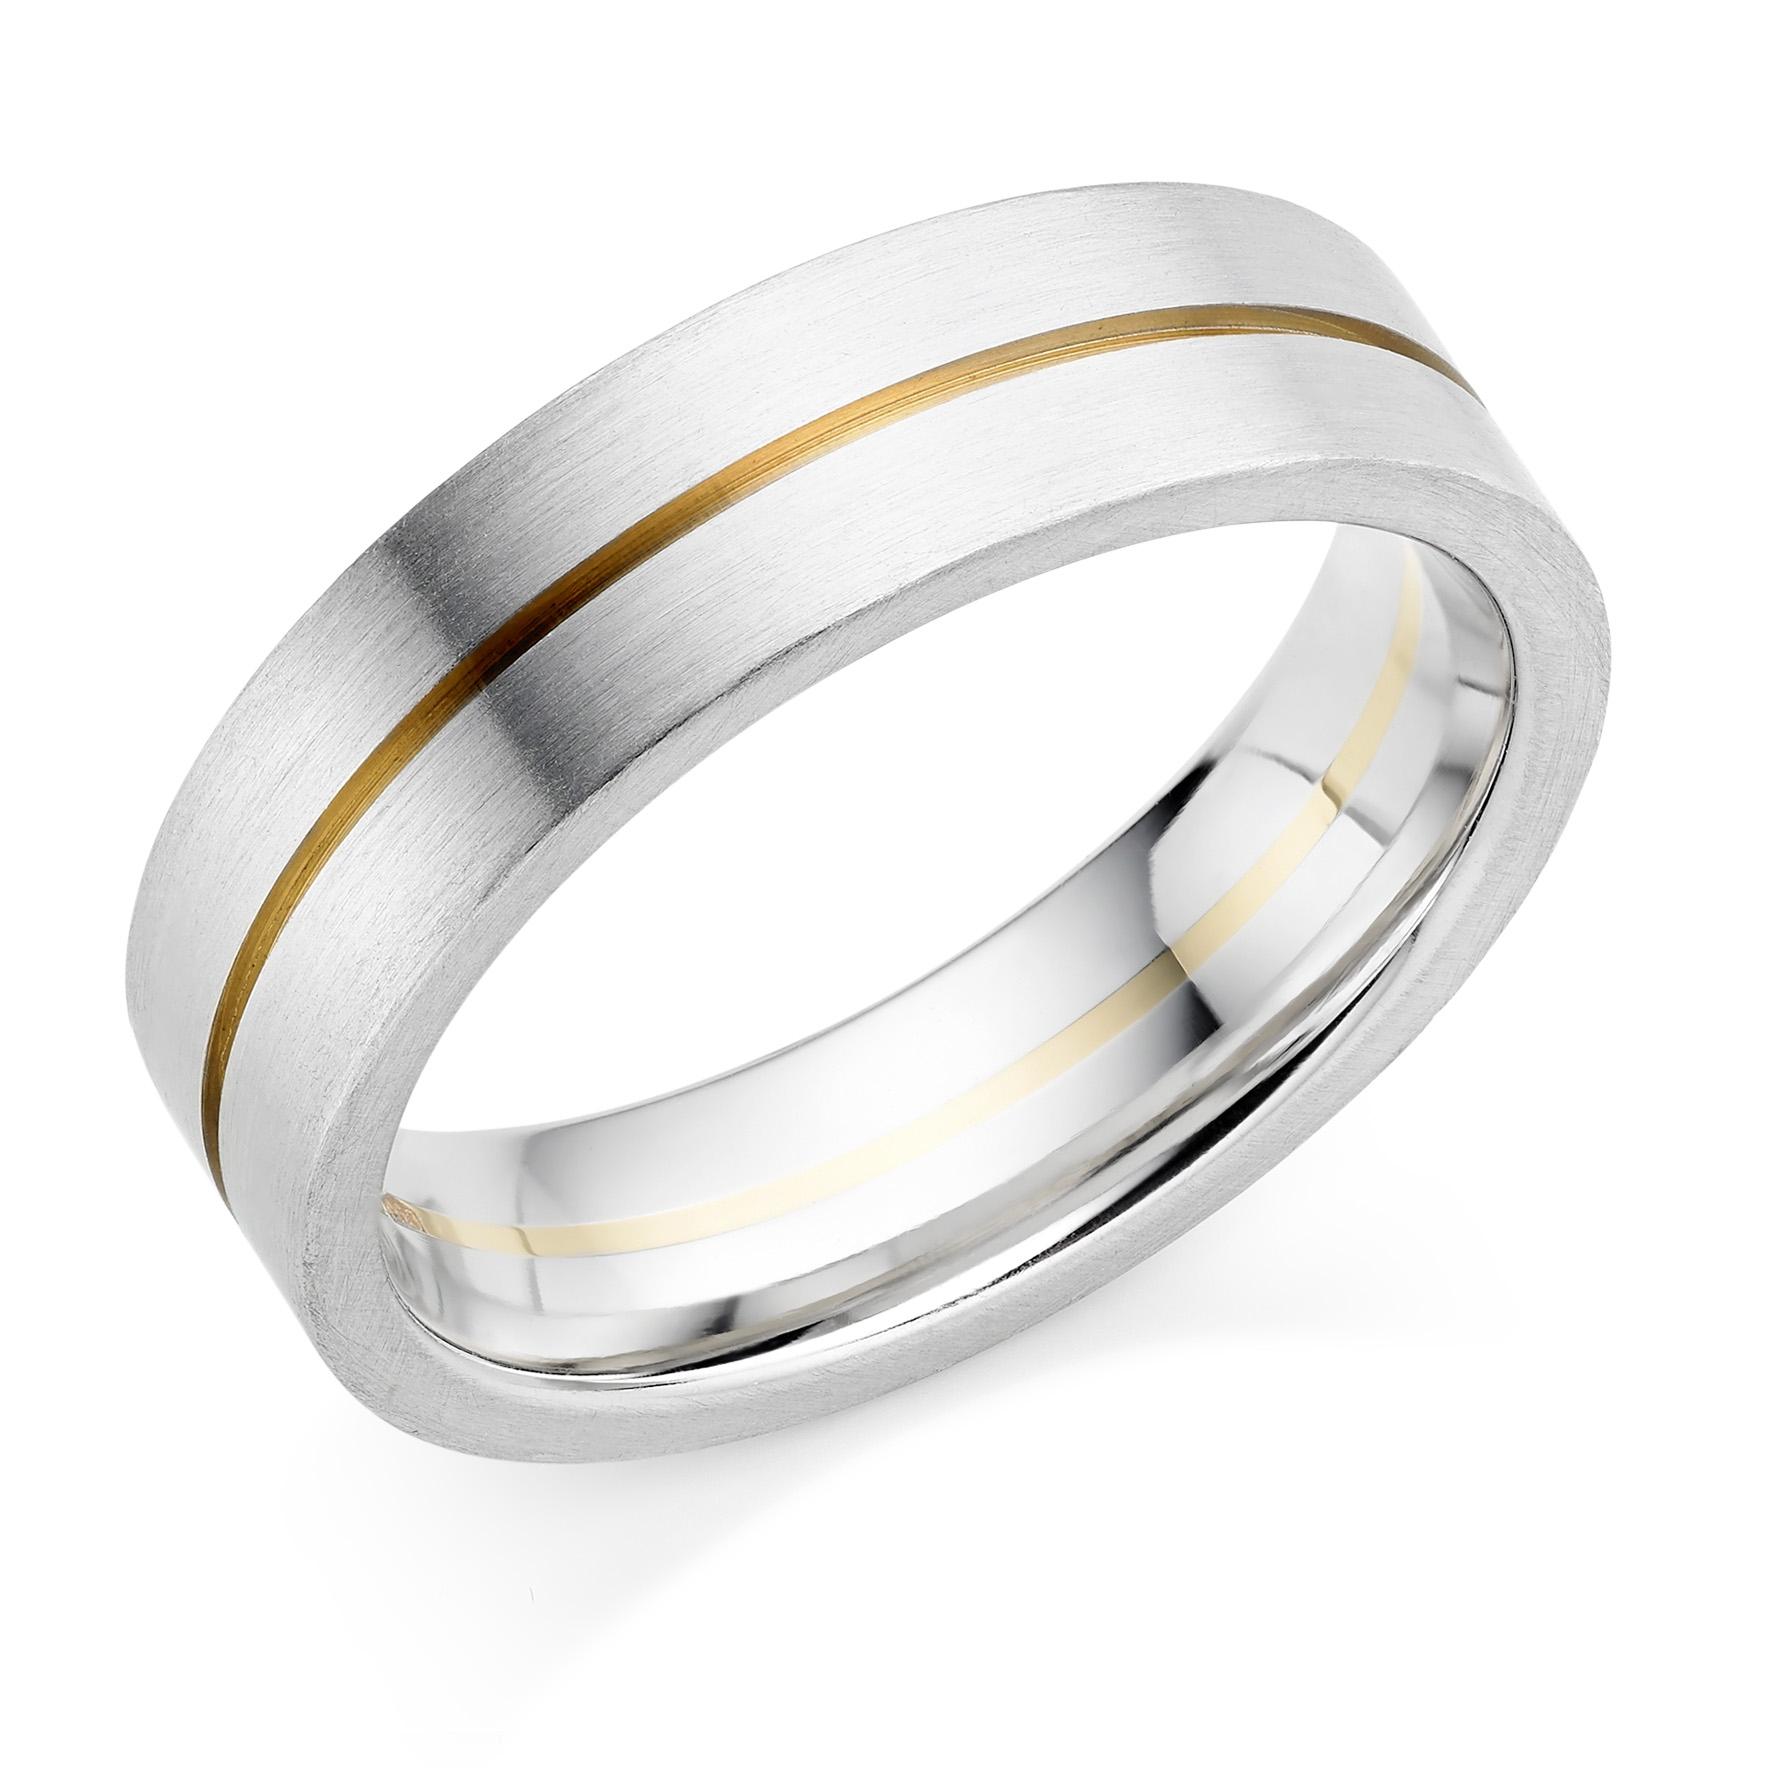 Wedding Rings in Hatton Garden - Two-tone